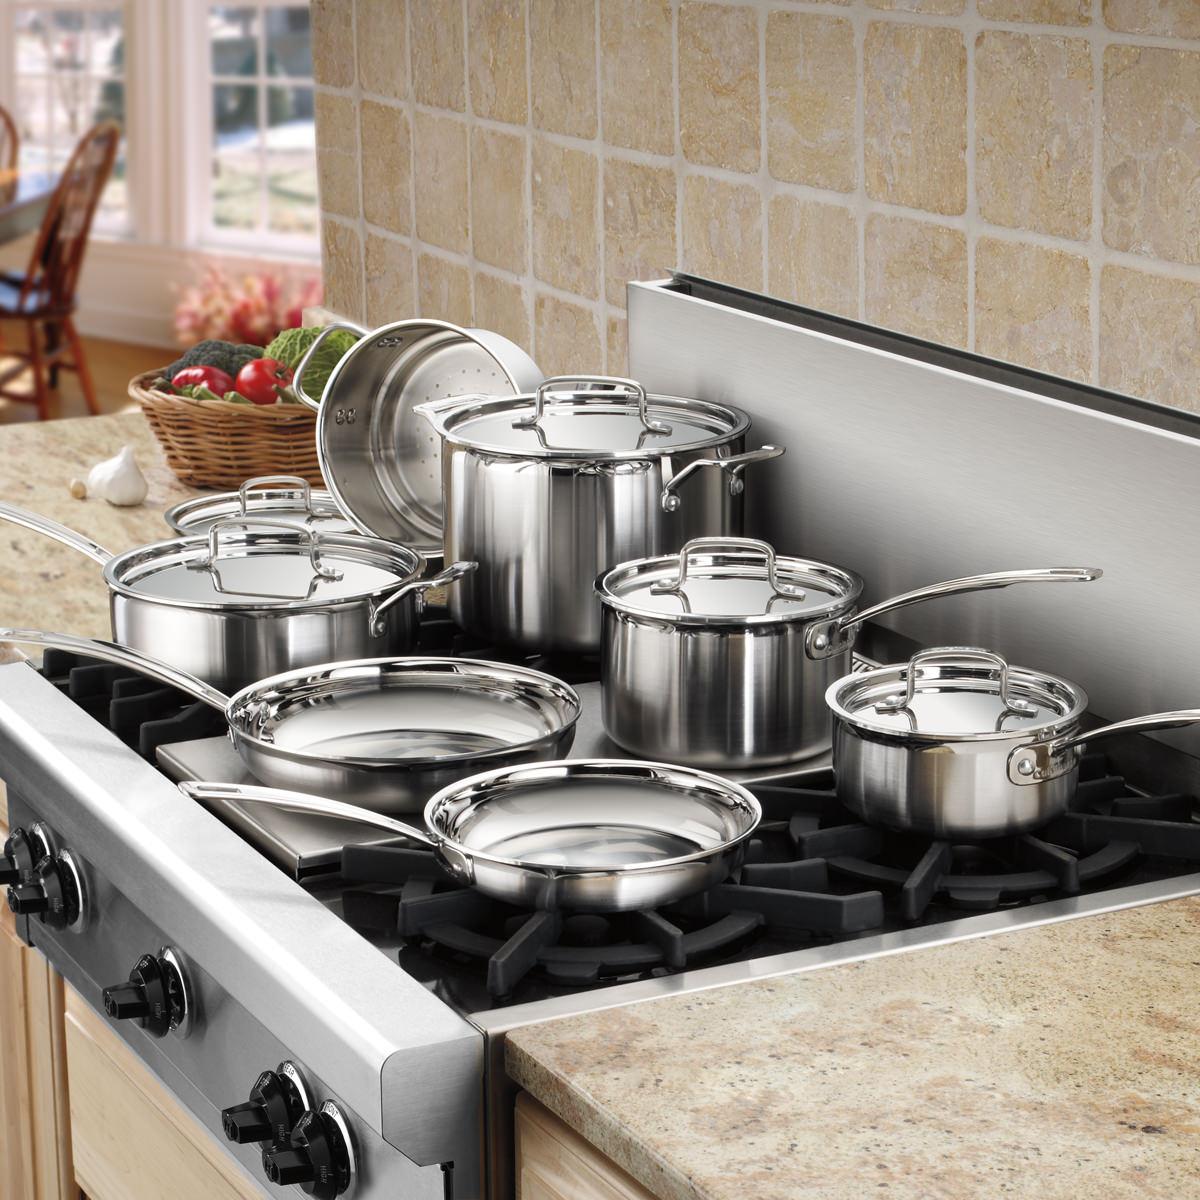 batterie de cuisine multiclad pro en acier inoxydable de 12 pi ces cuisinart. Black Bedroom Furniture Sets. Home Design Ideas